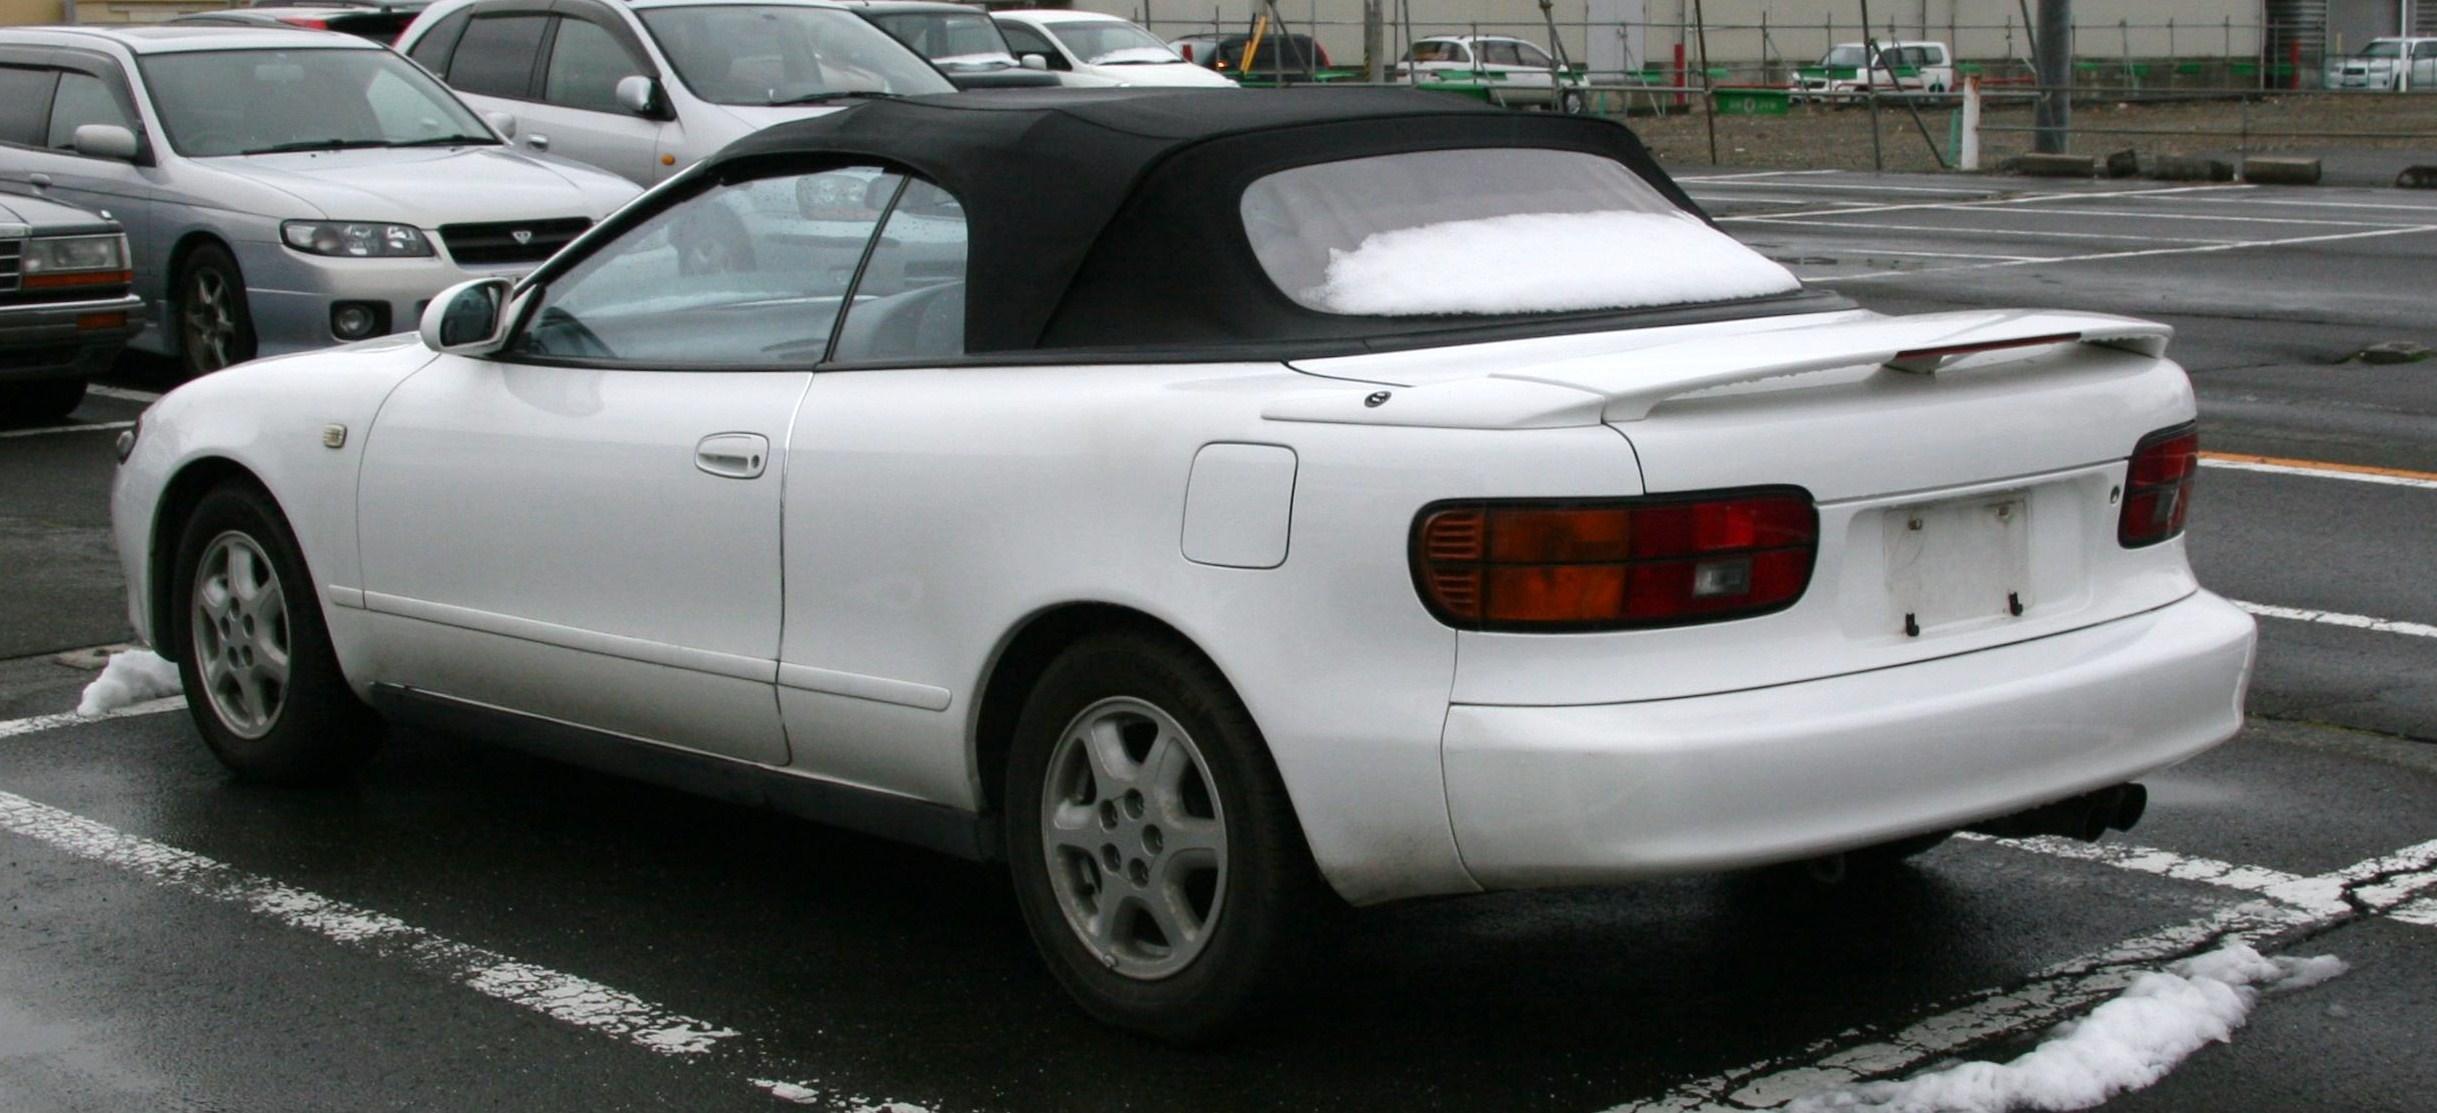 File:Toyota Celica ST183C 02 rear.jpg